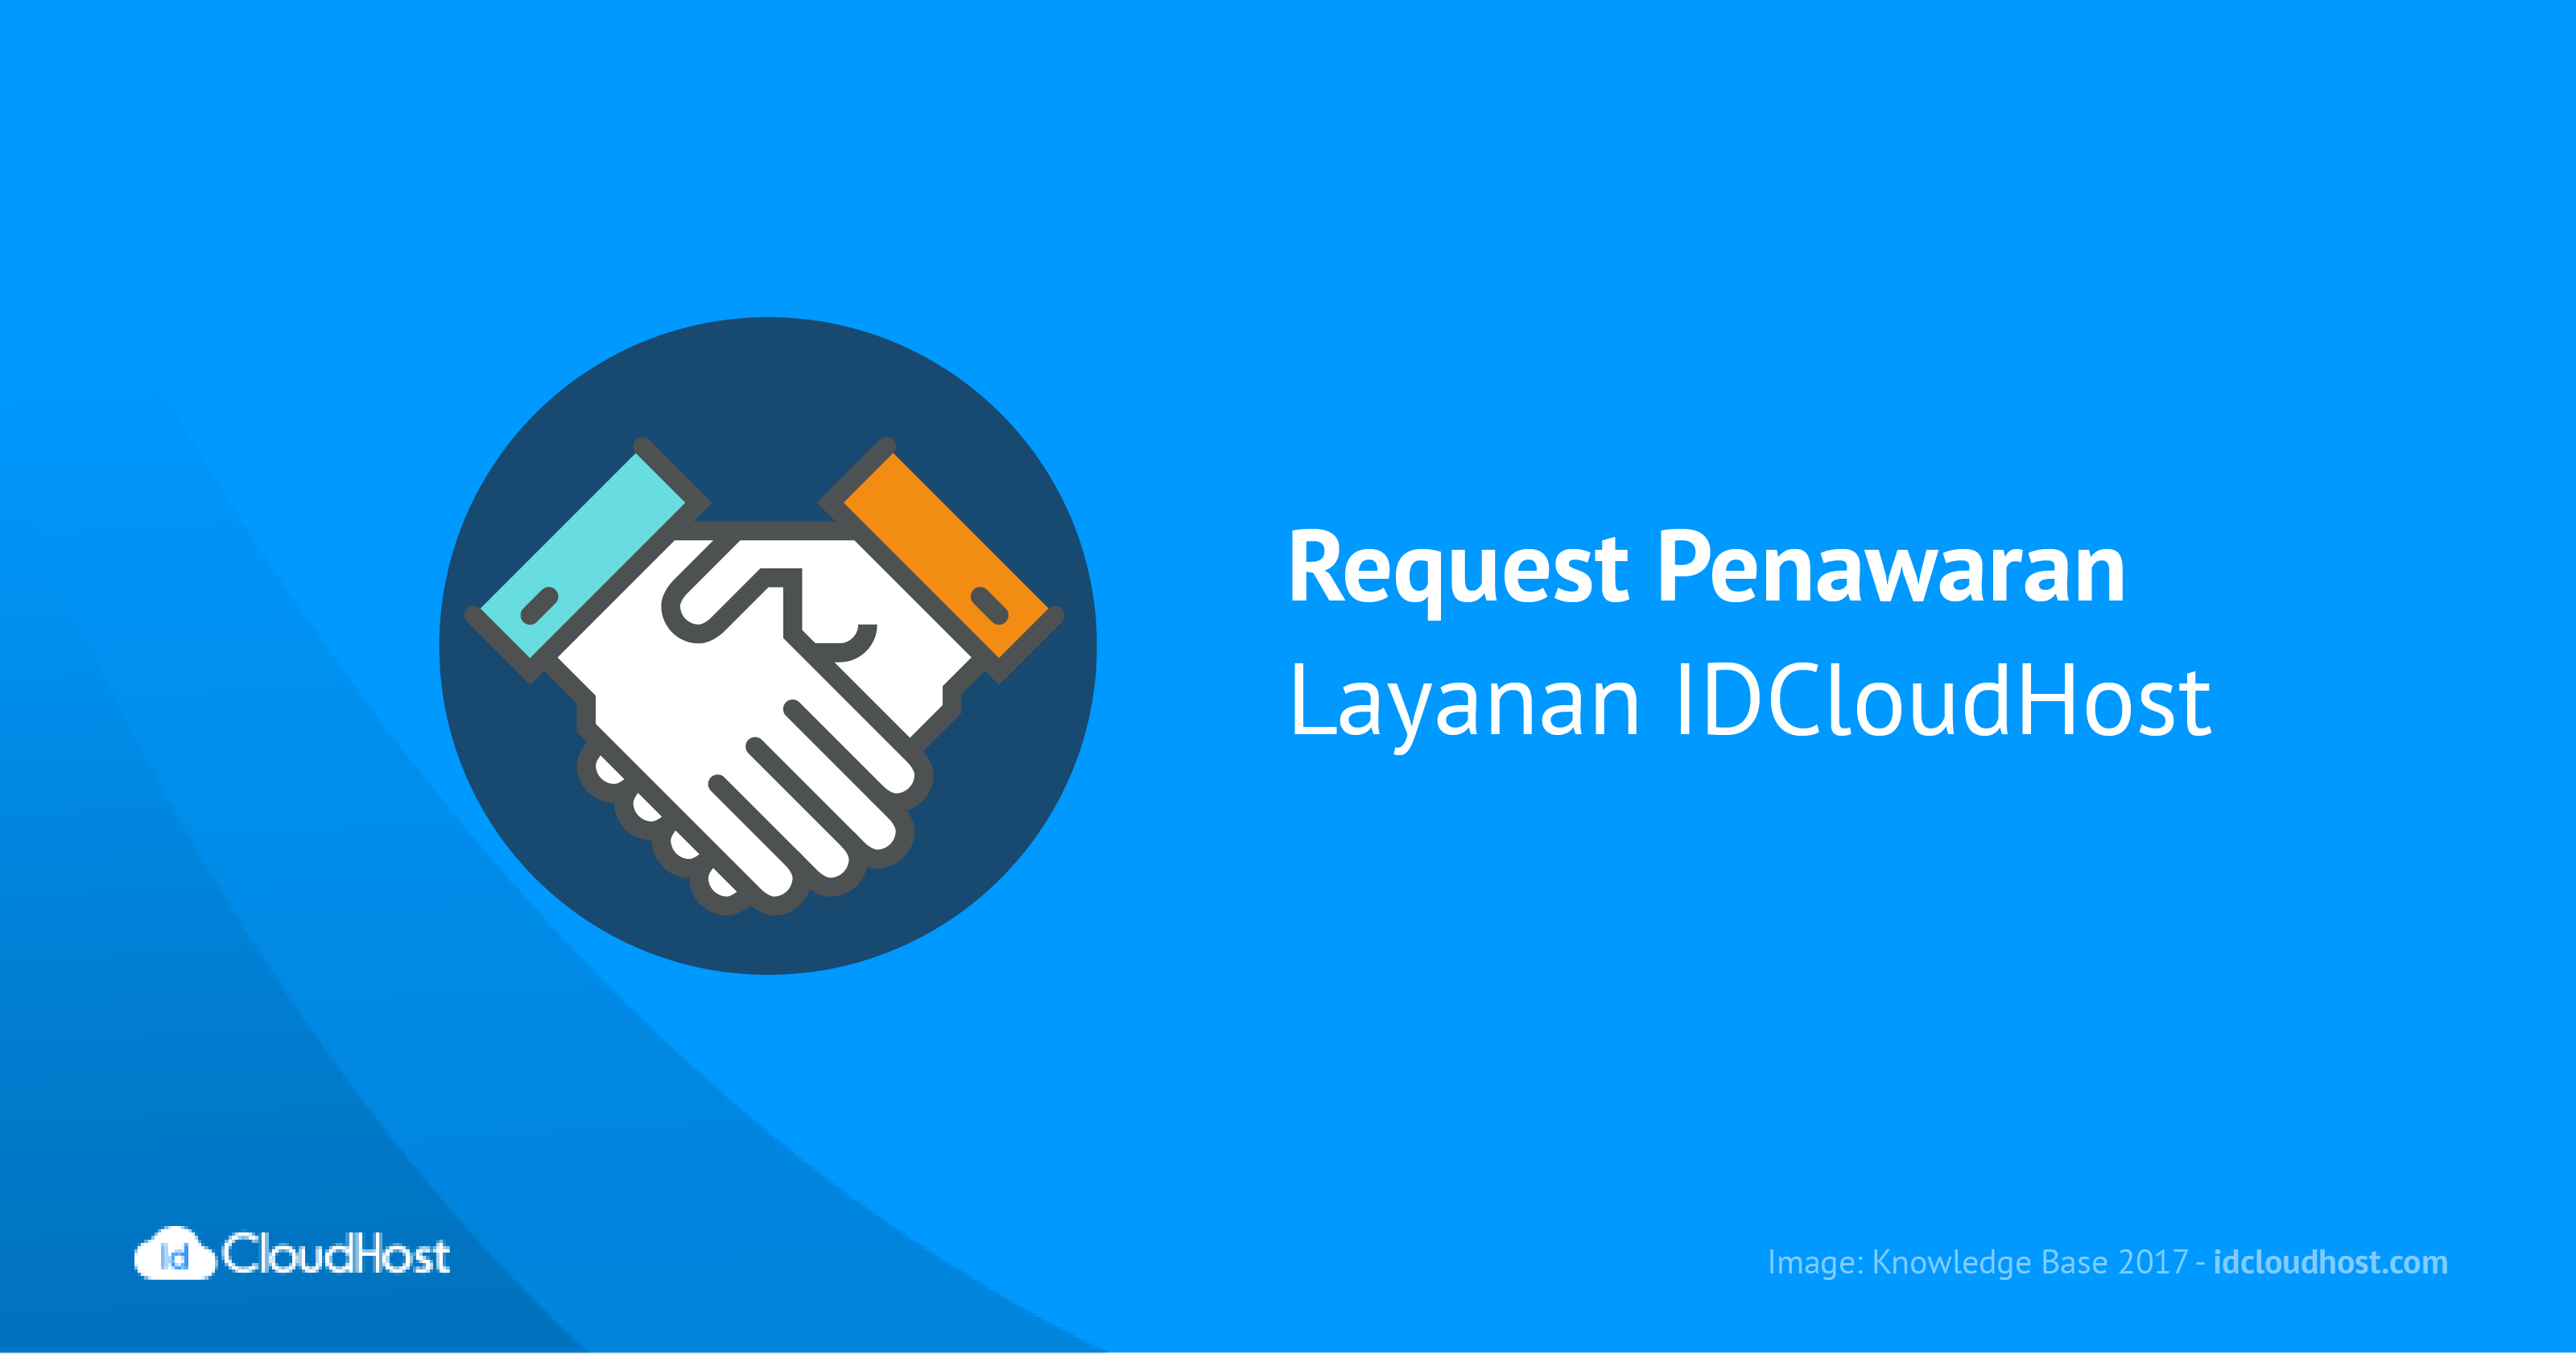 Request Penawaran Layanan IDCloudHost